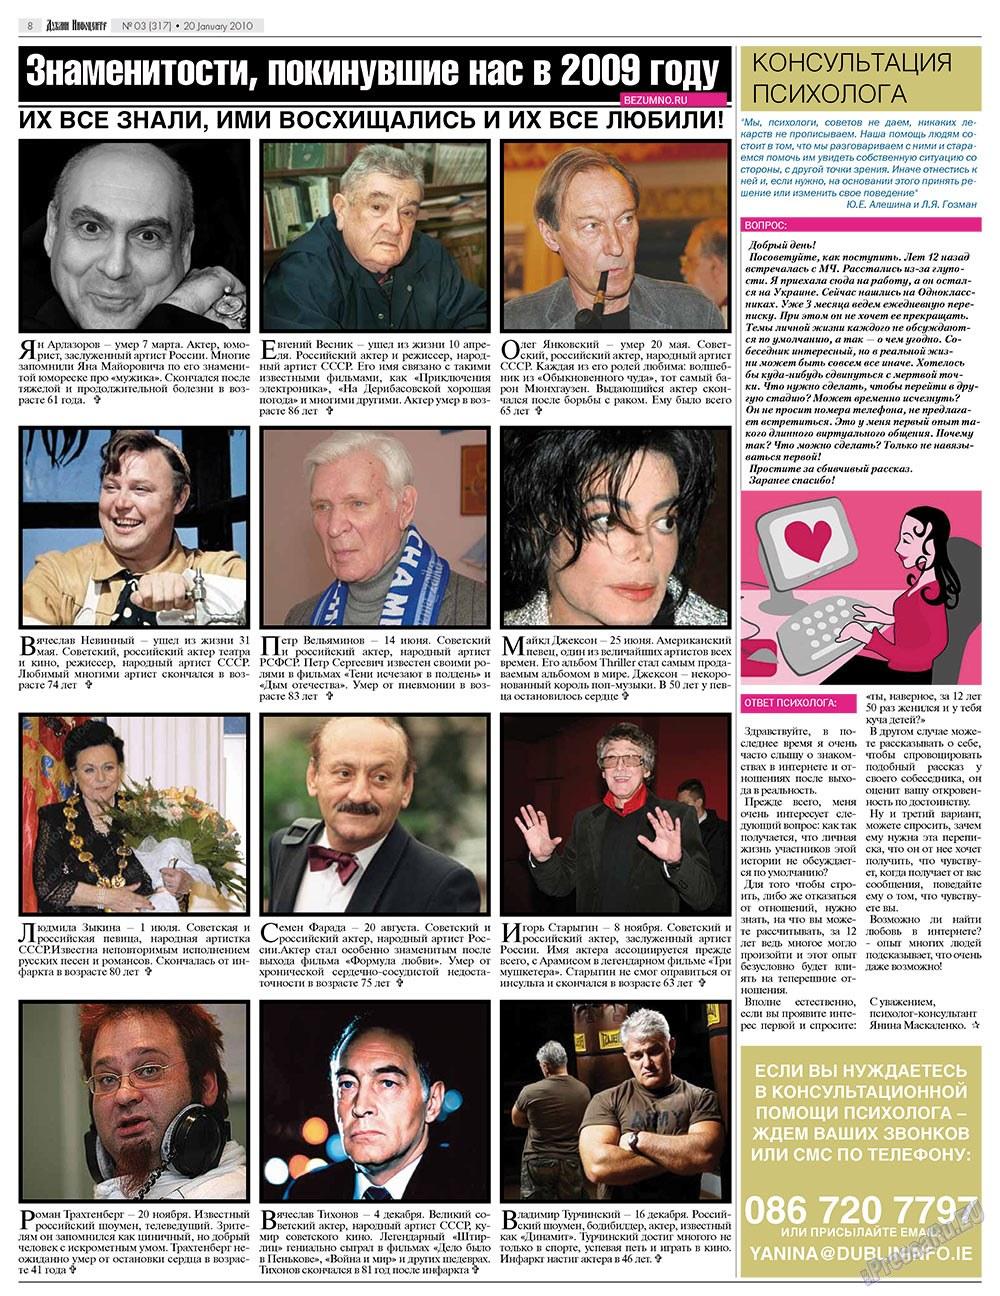 Дублин инфоцентр (газета). 2010 год, номер 3, стр. 8